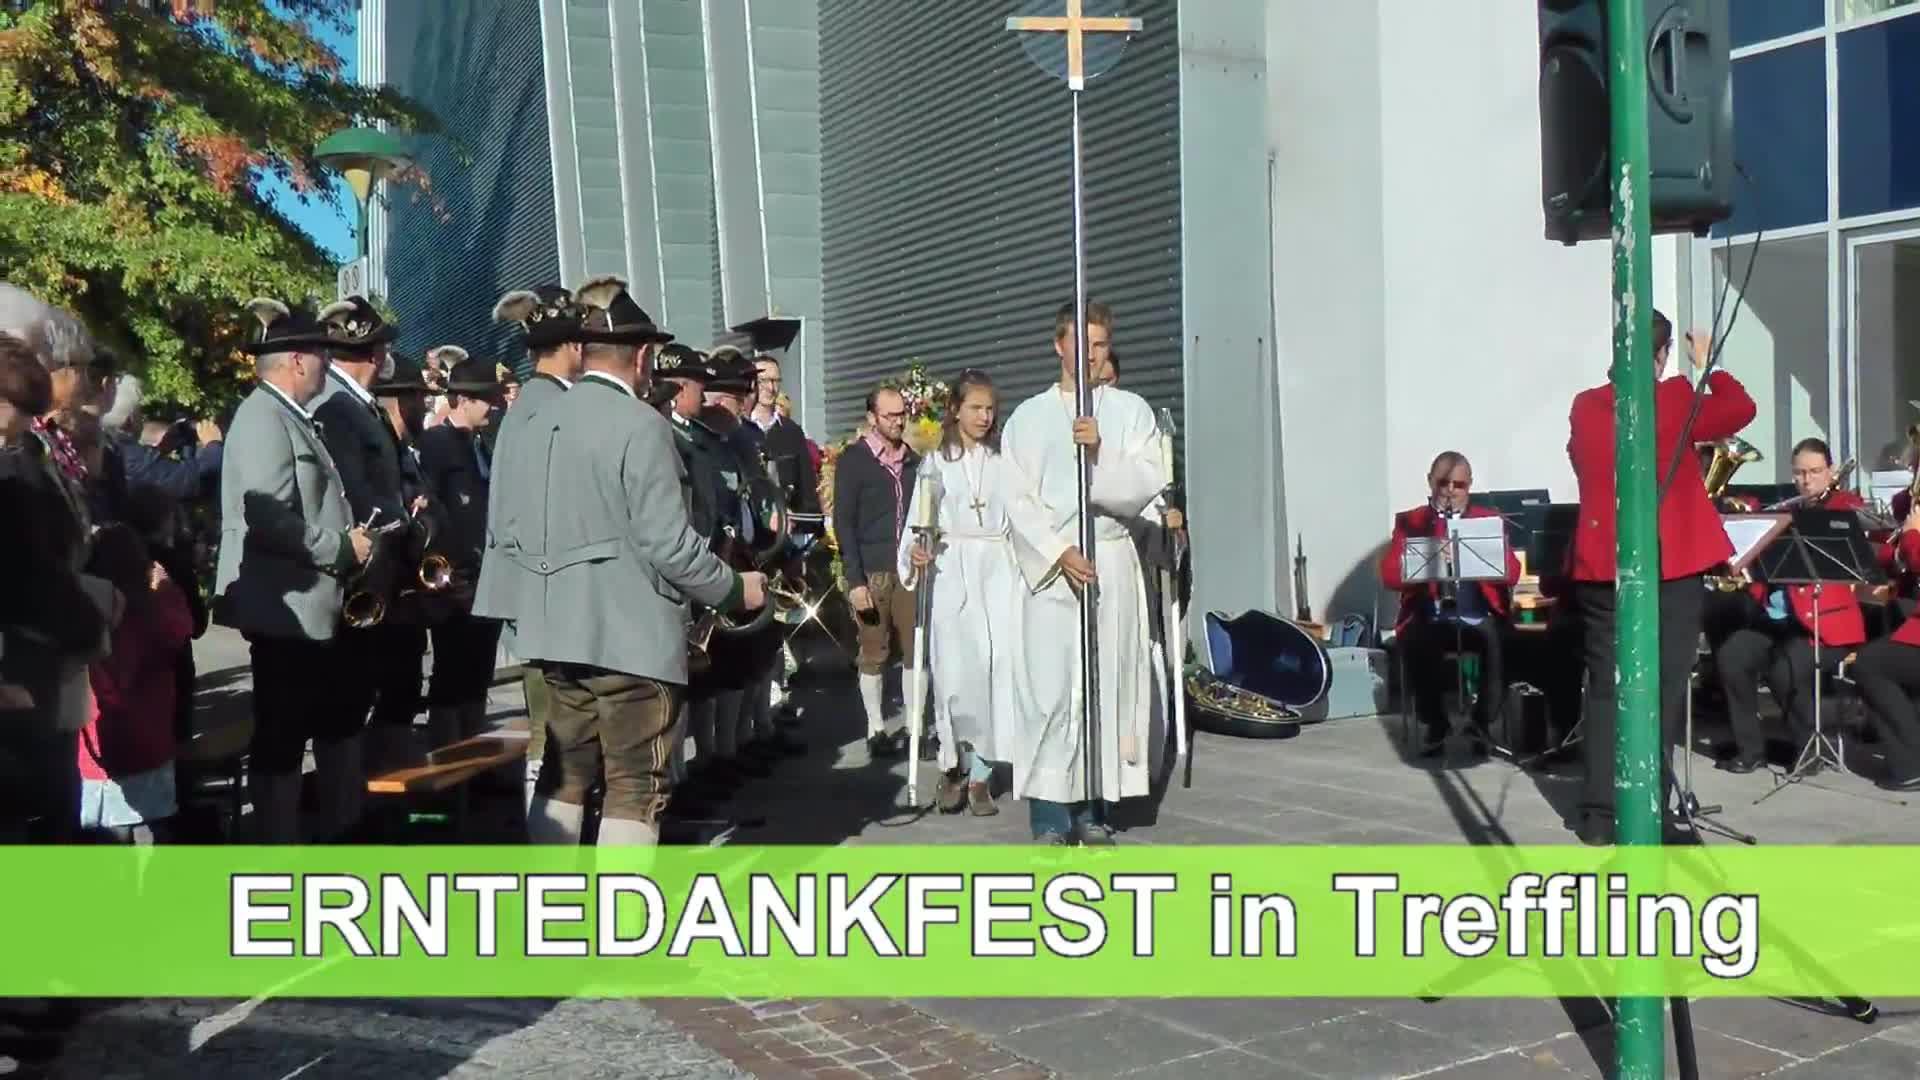 Erntedankfest in Treffling